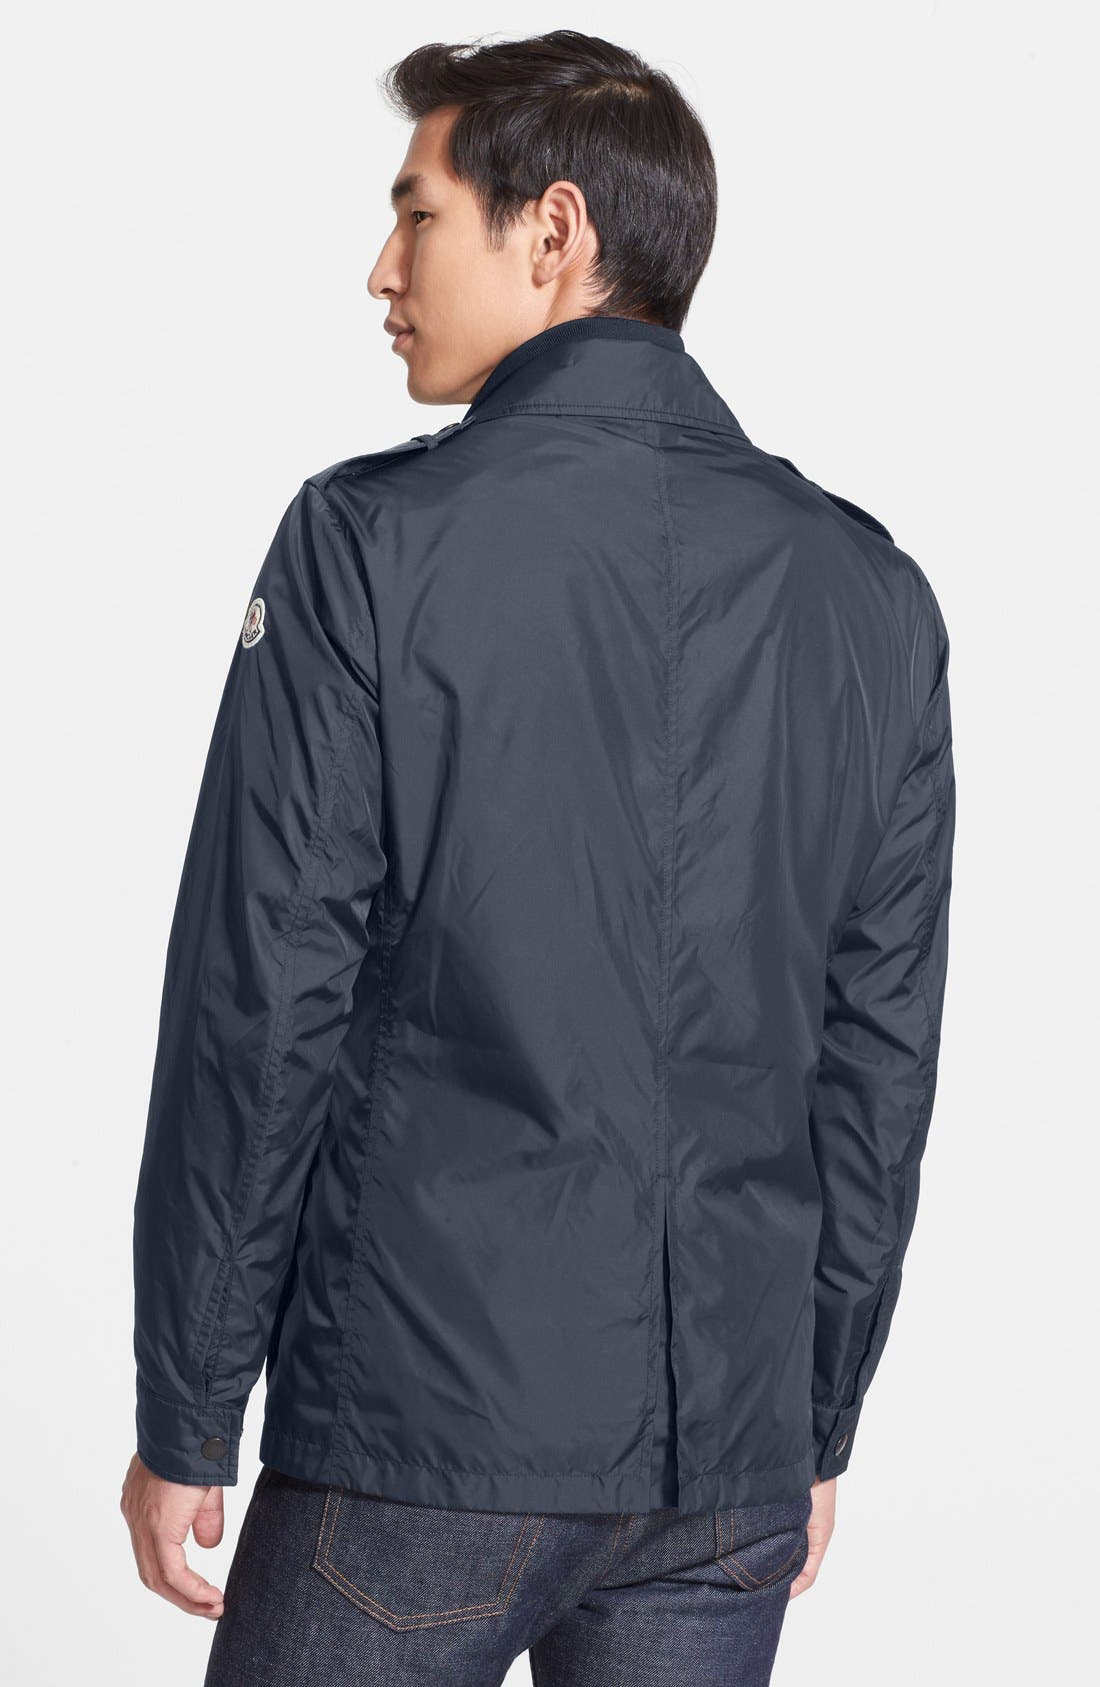 moncler kilian jacket